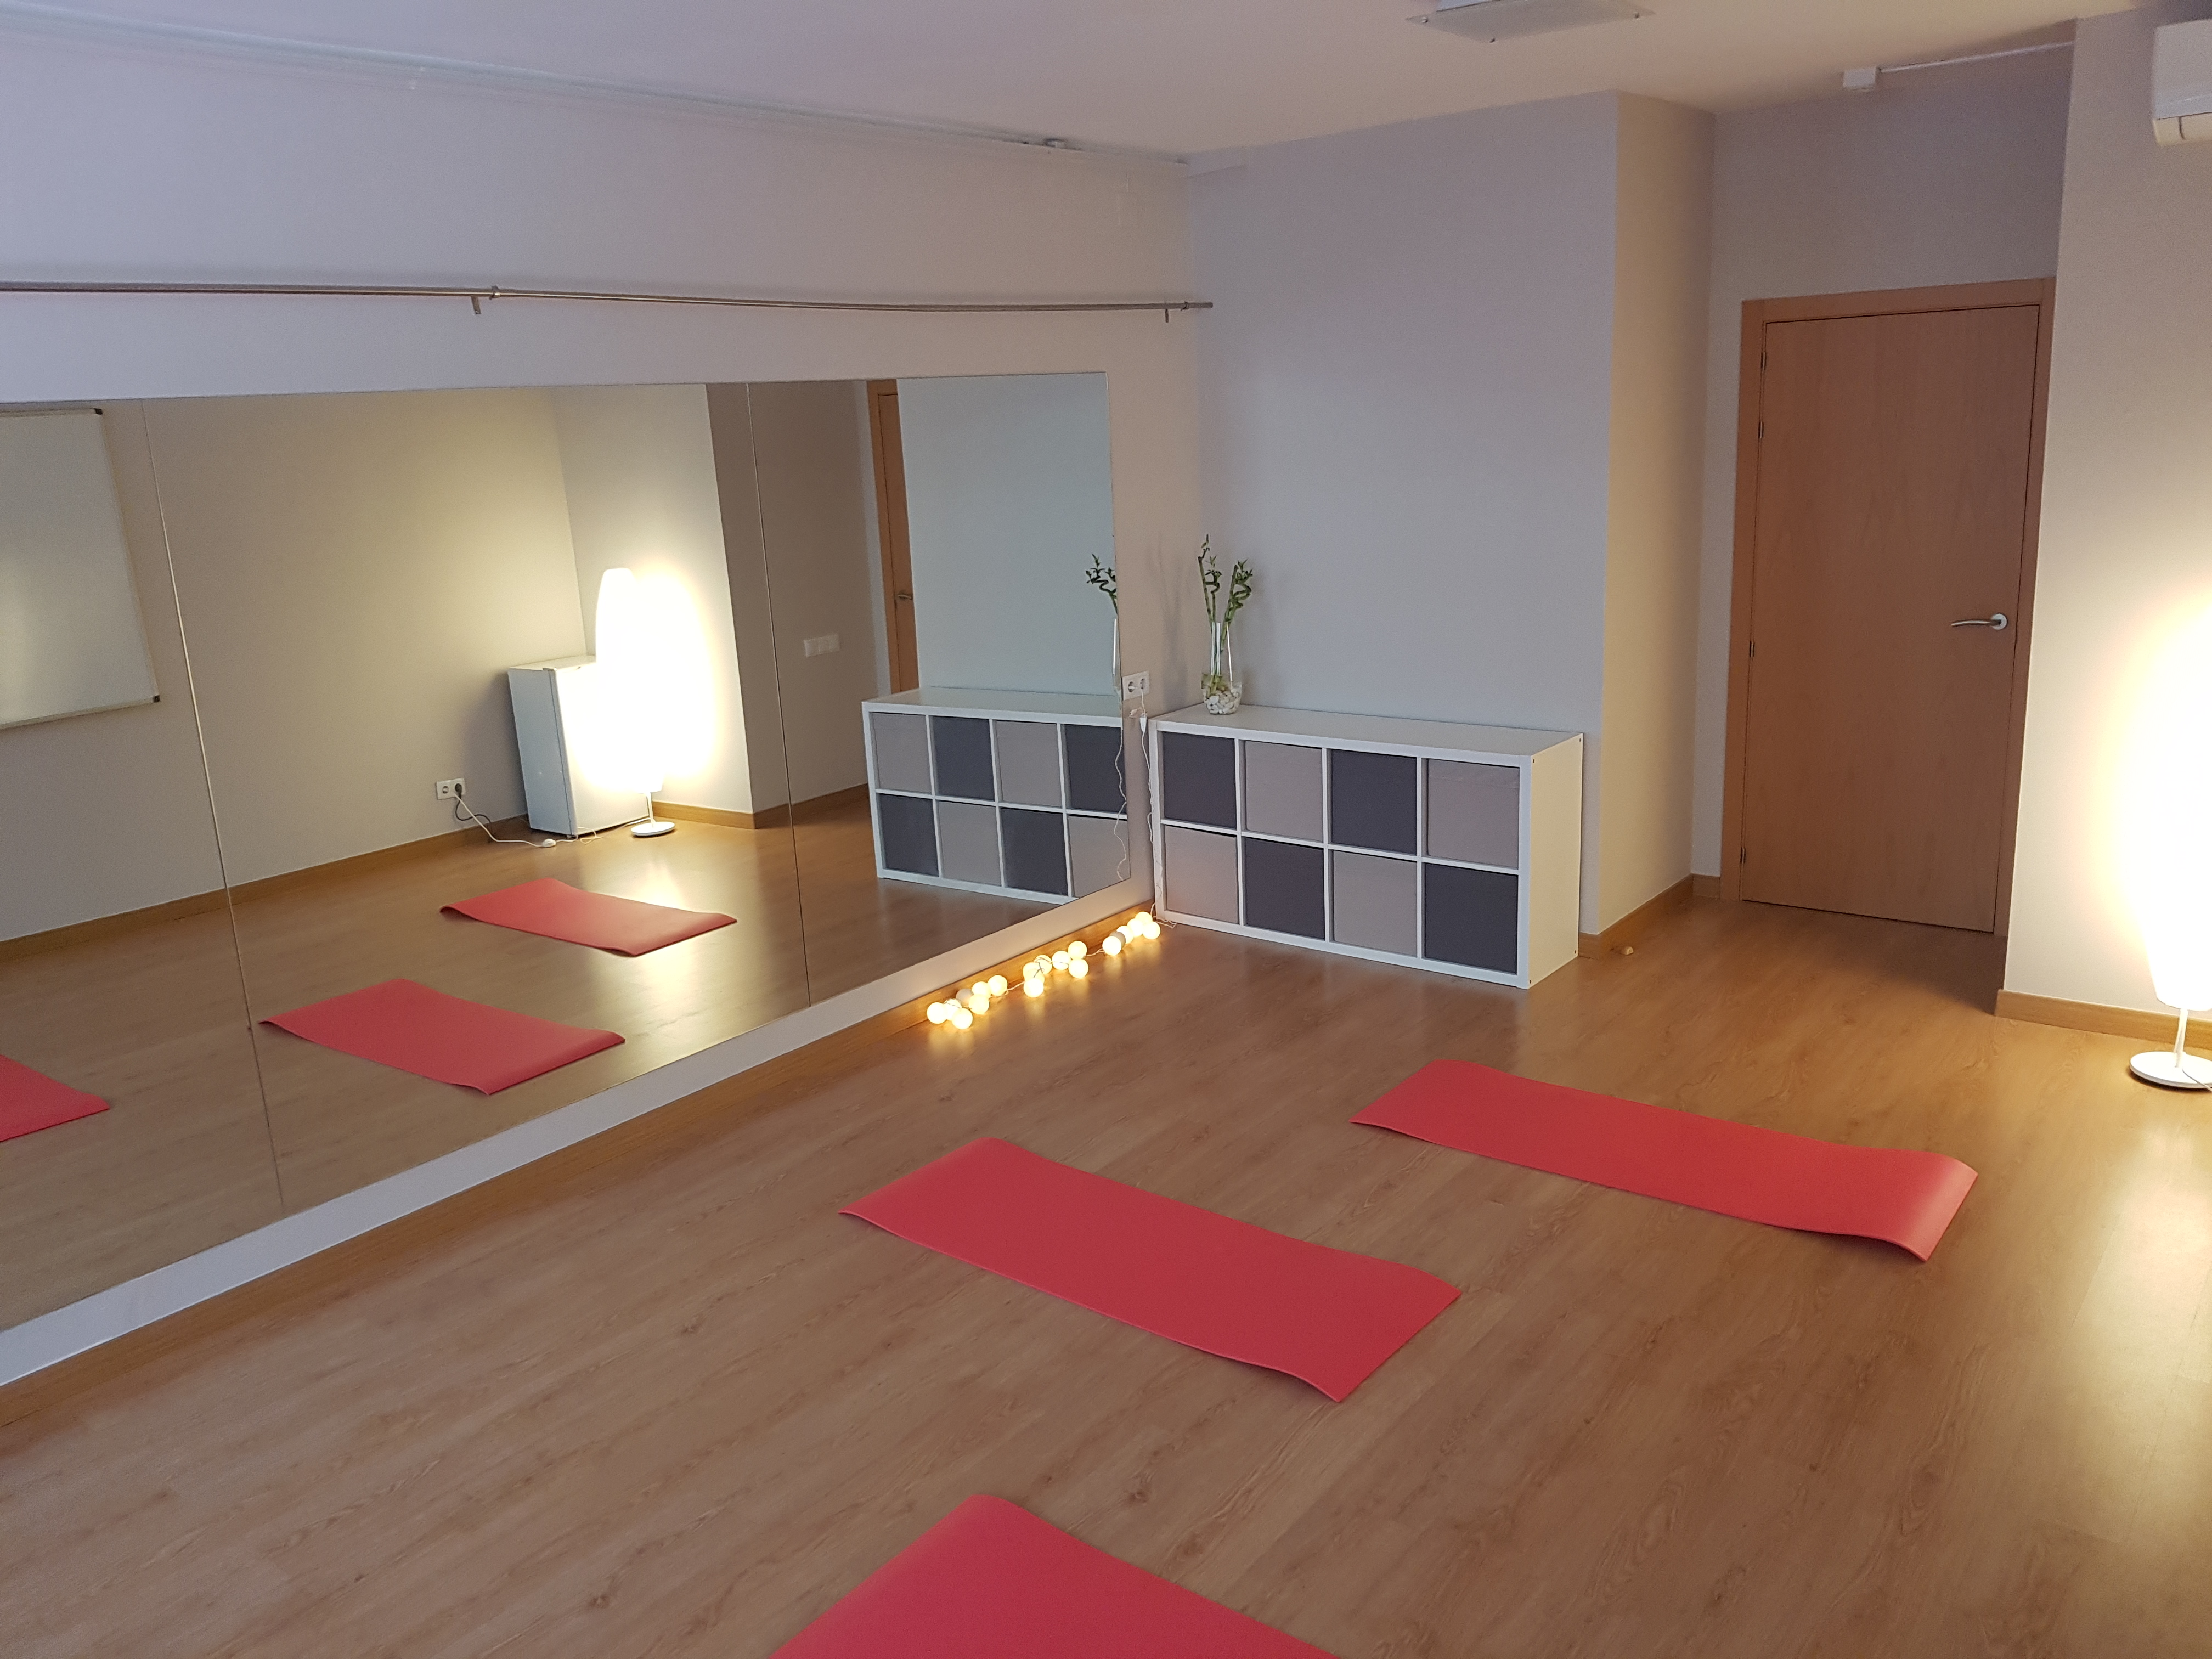 Sala del centro para pilates